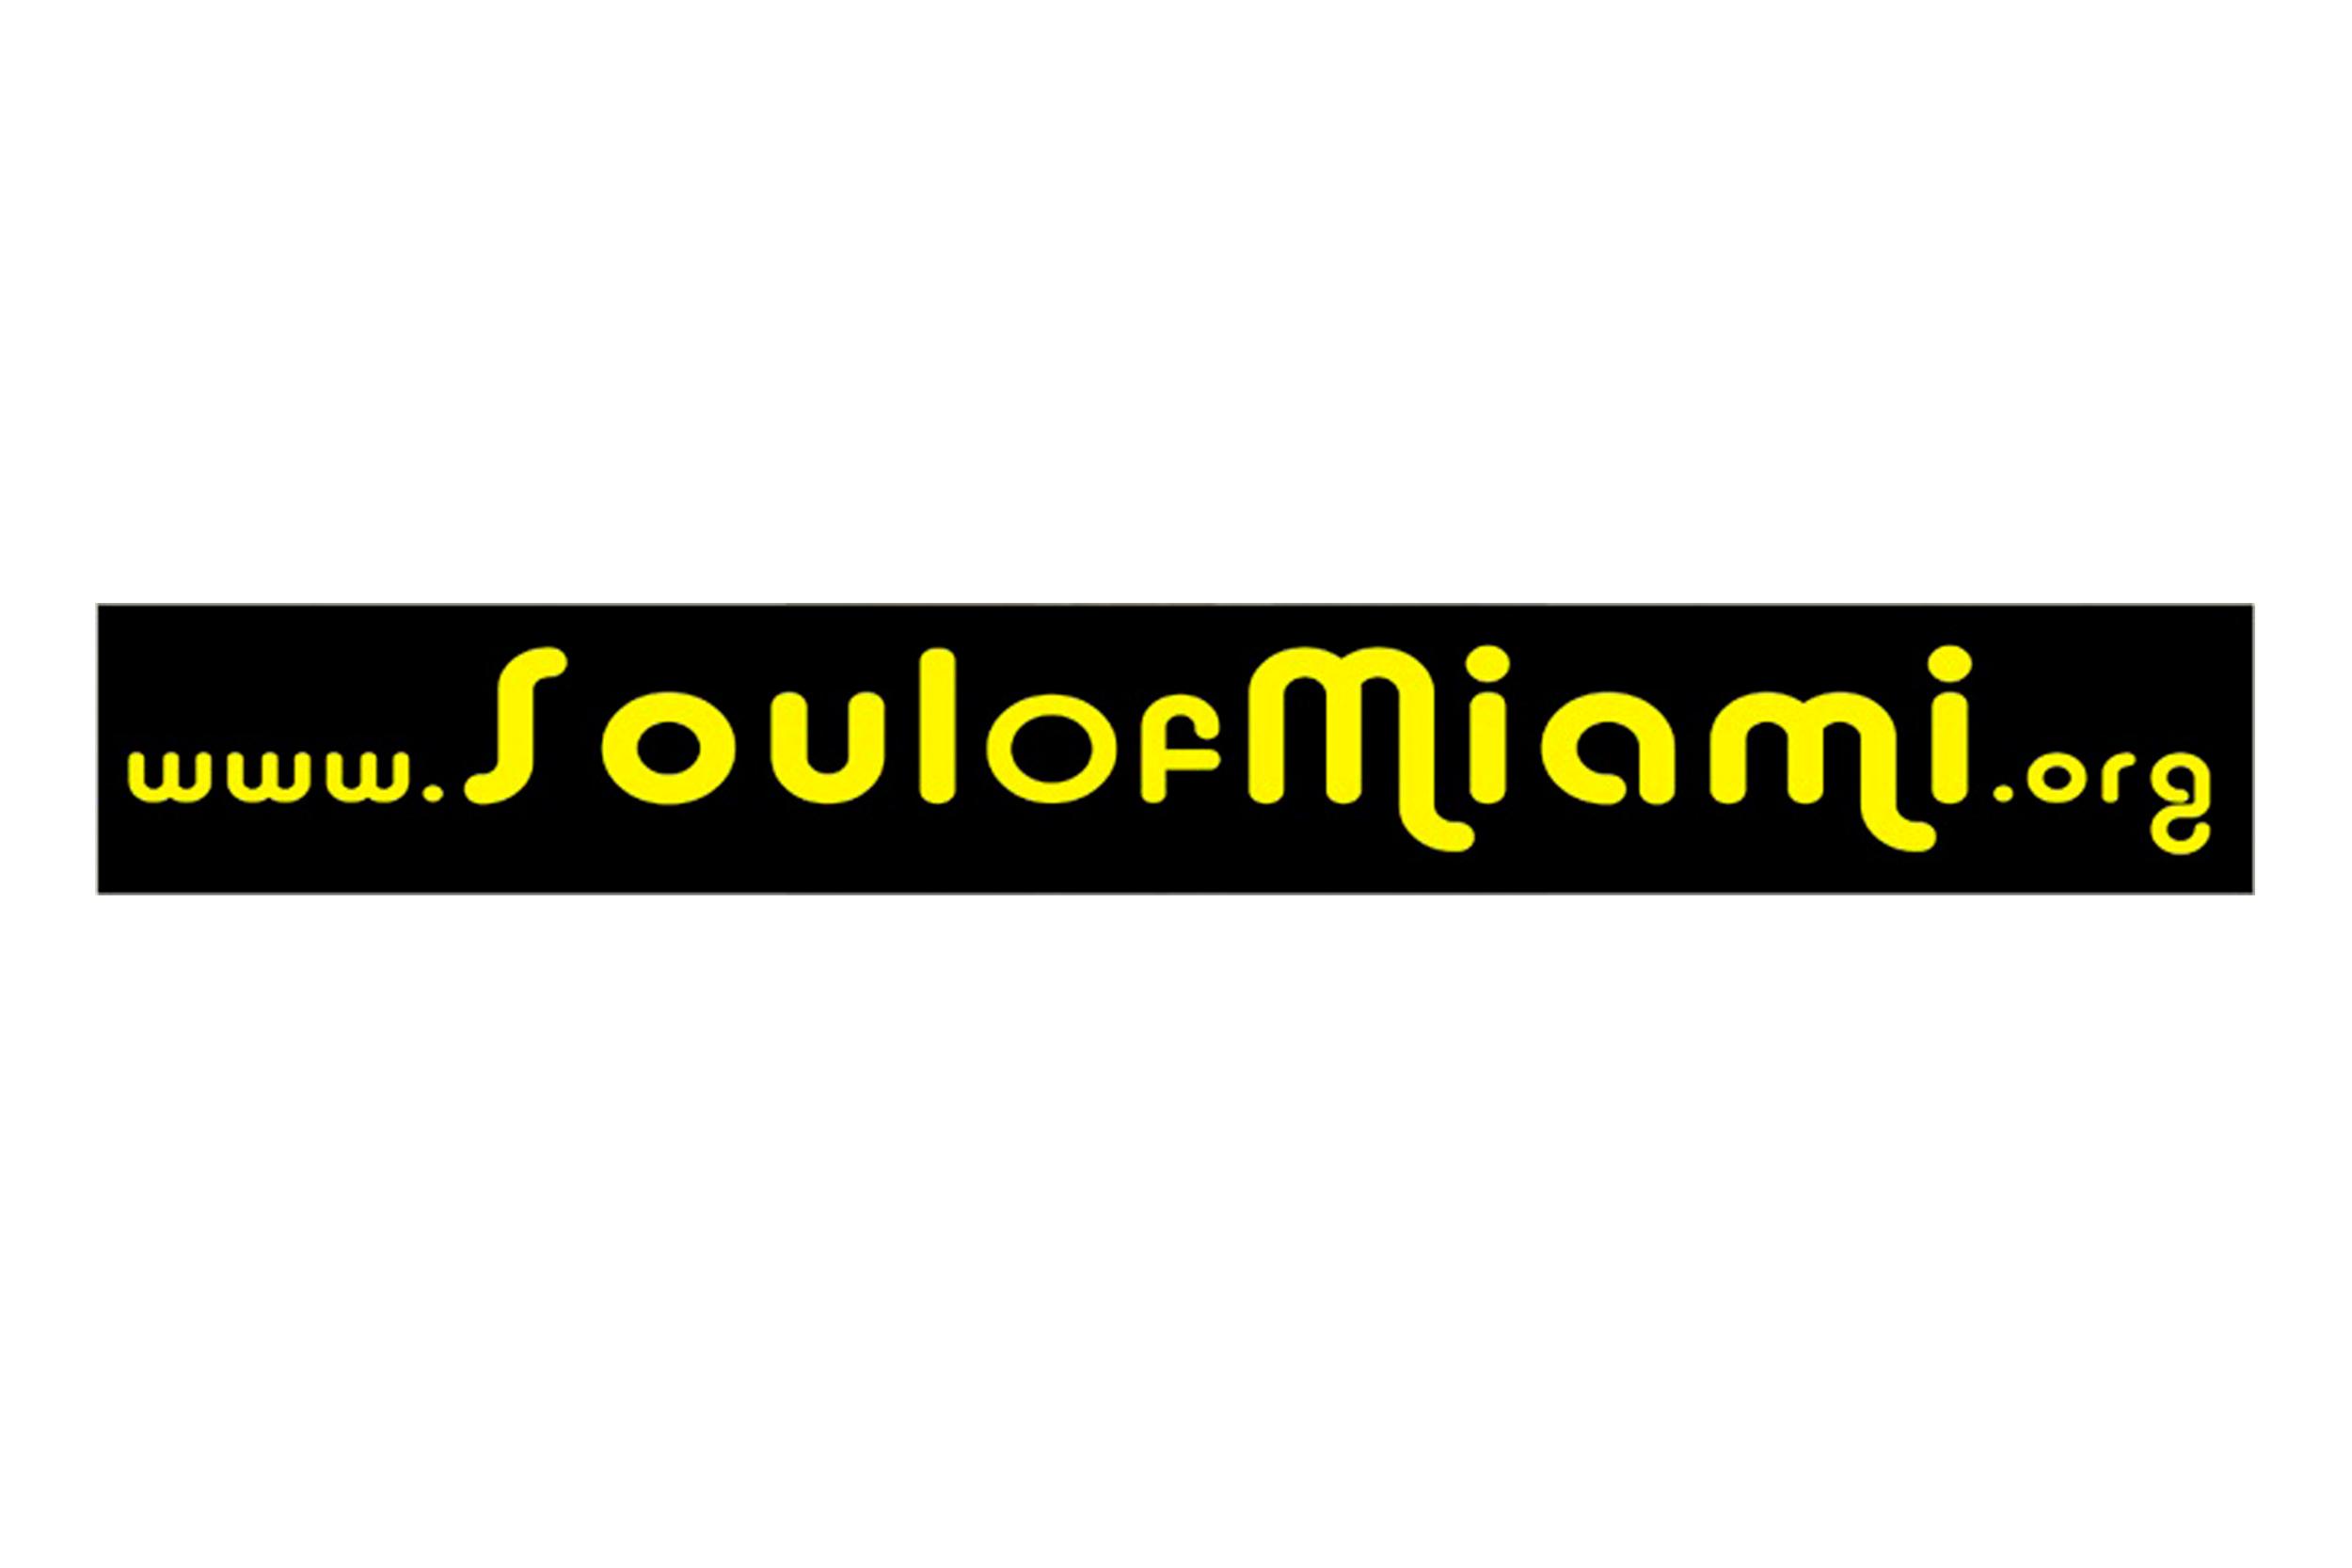 soul of miami // oct 2013